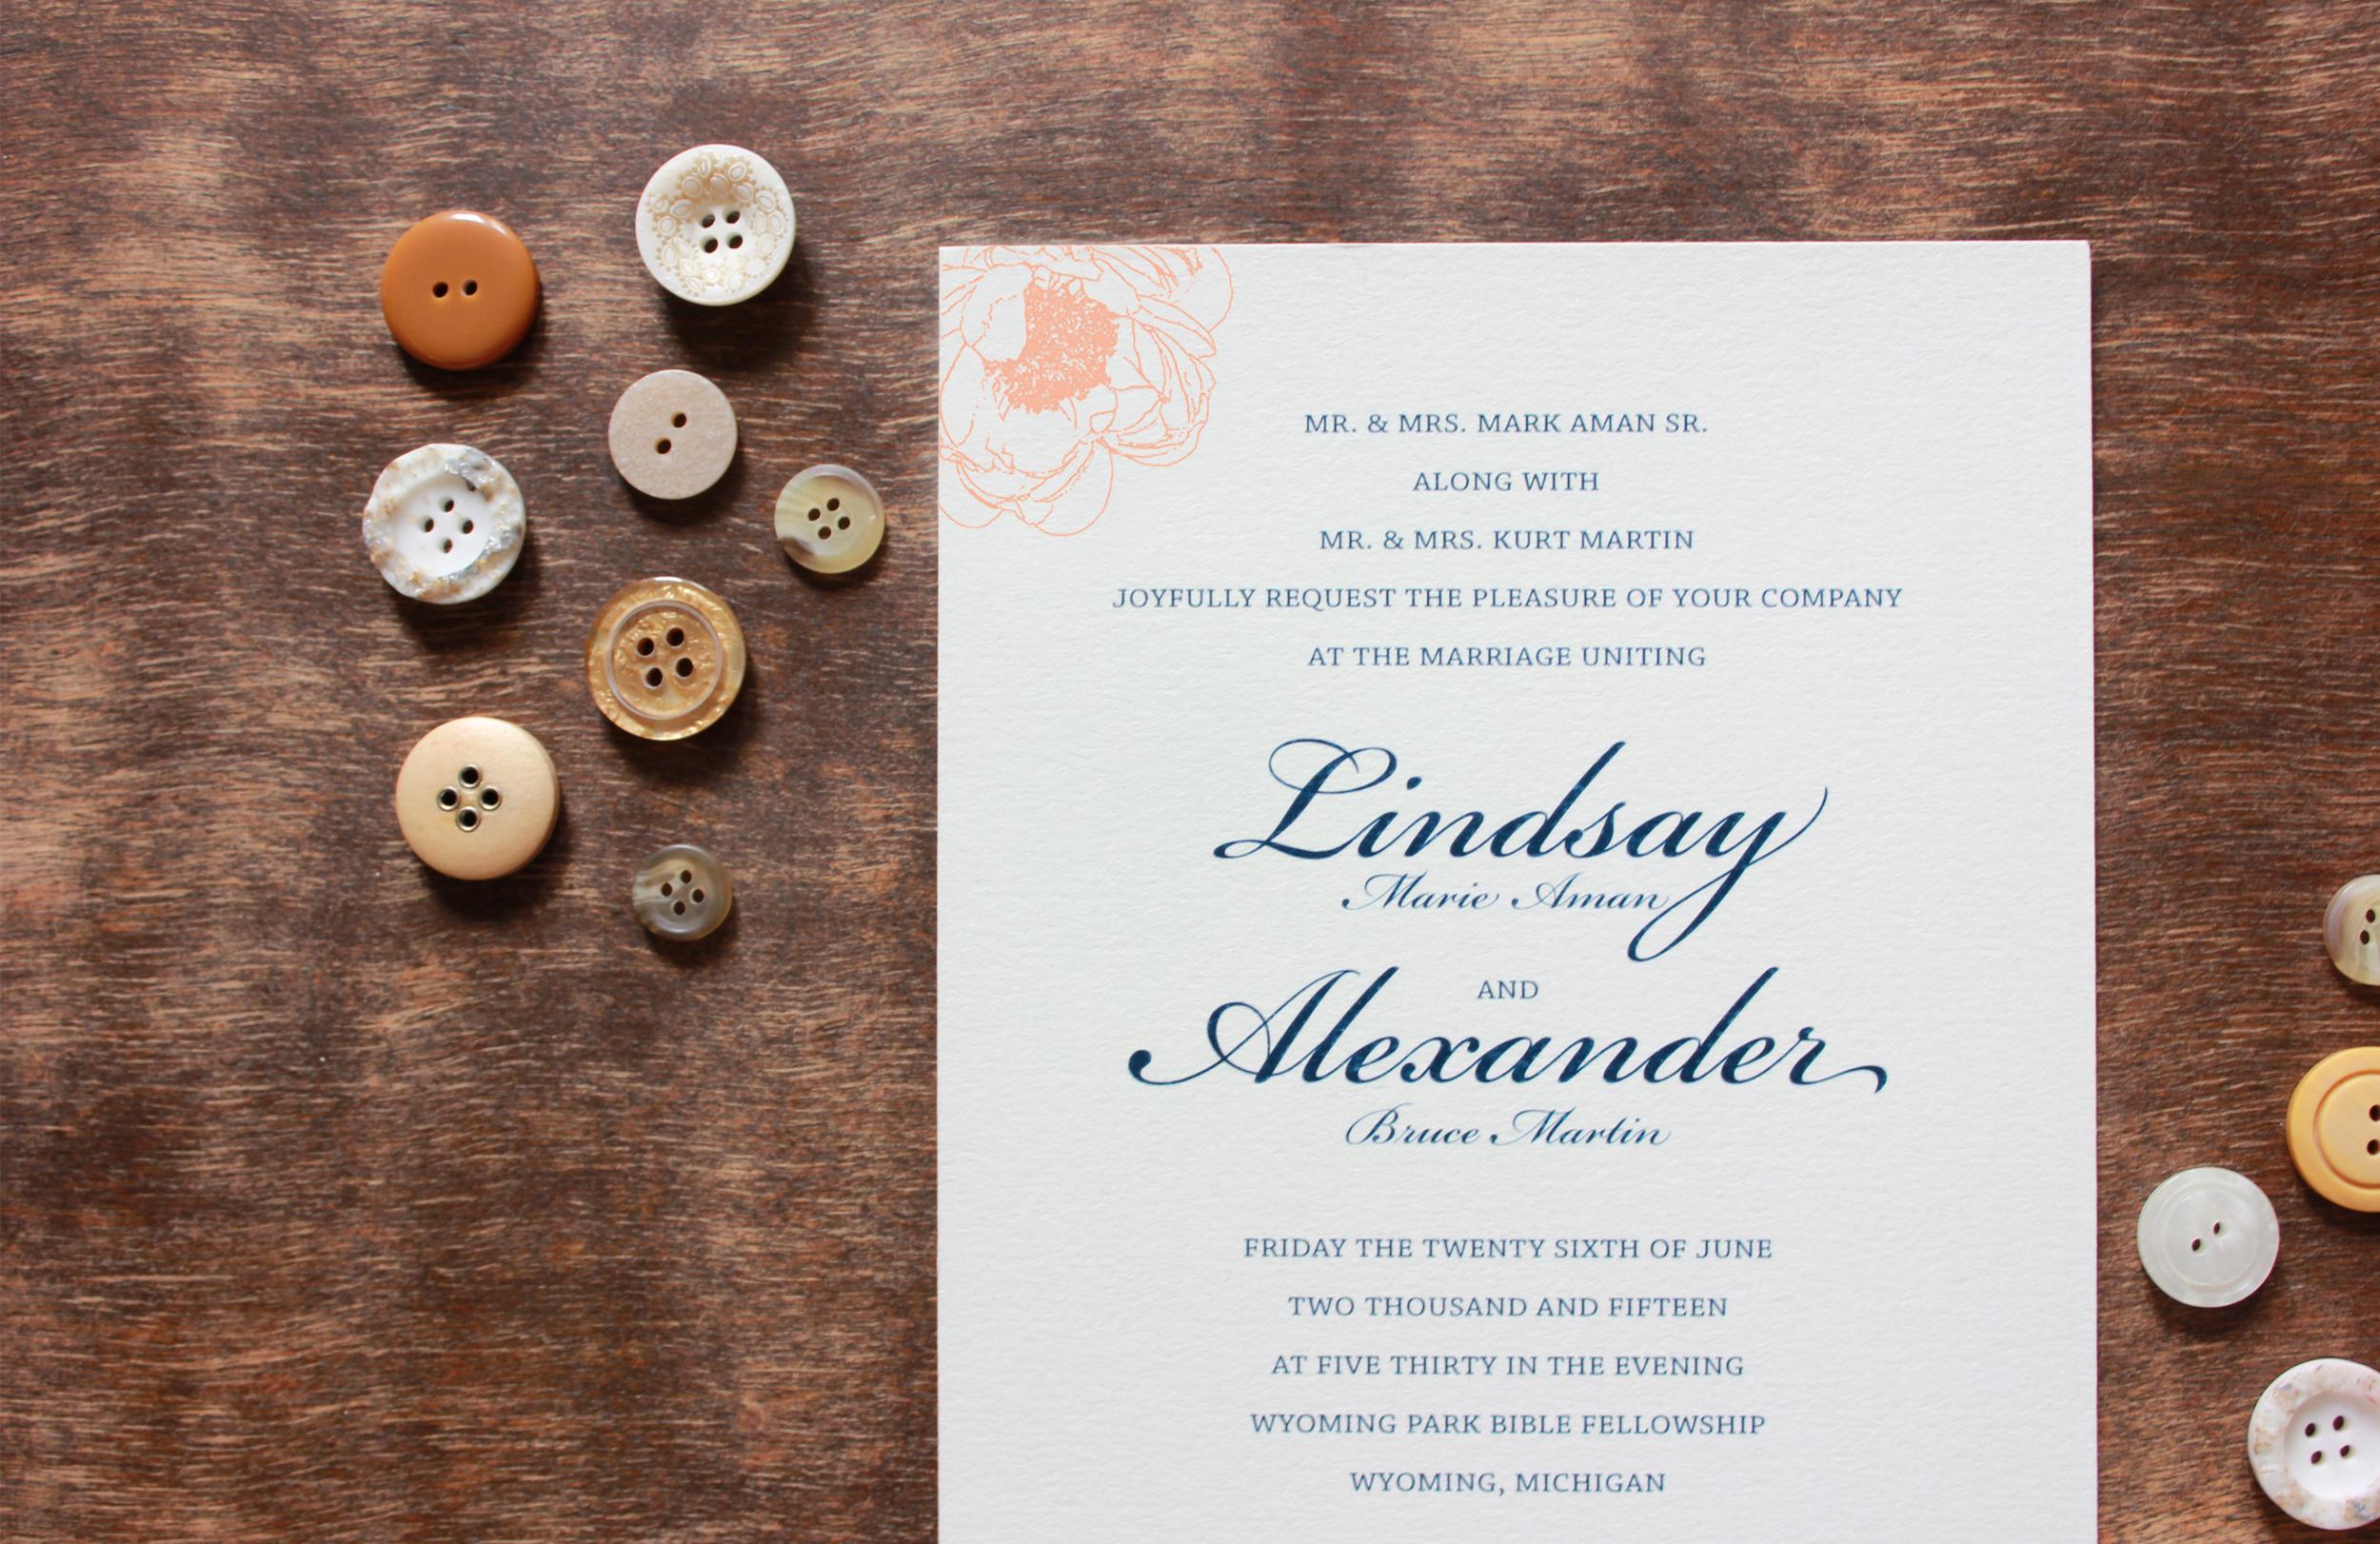 L+A_Wedding Stationery pic 3.jpg